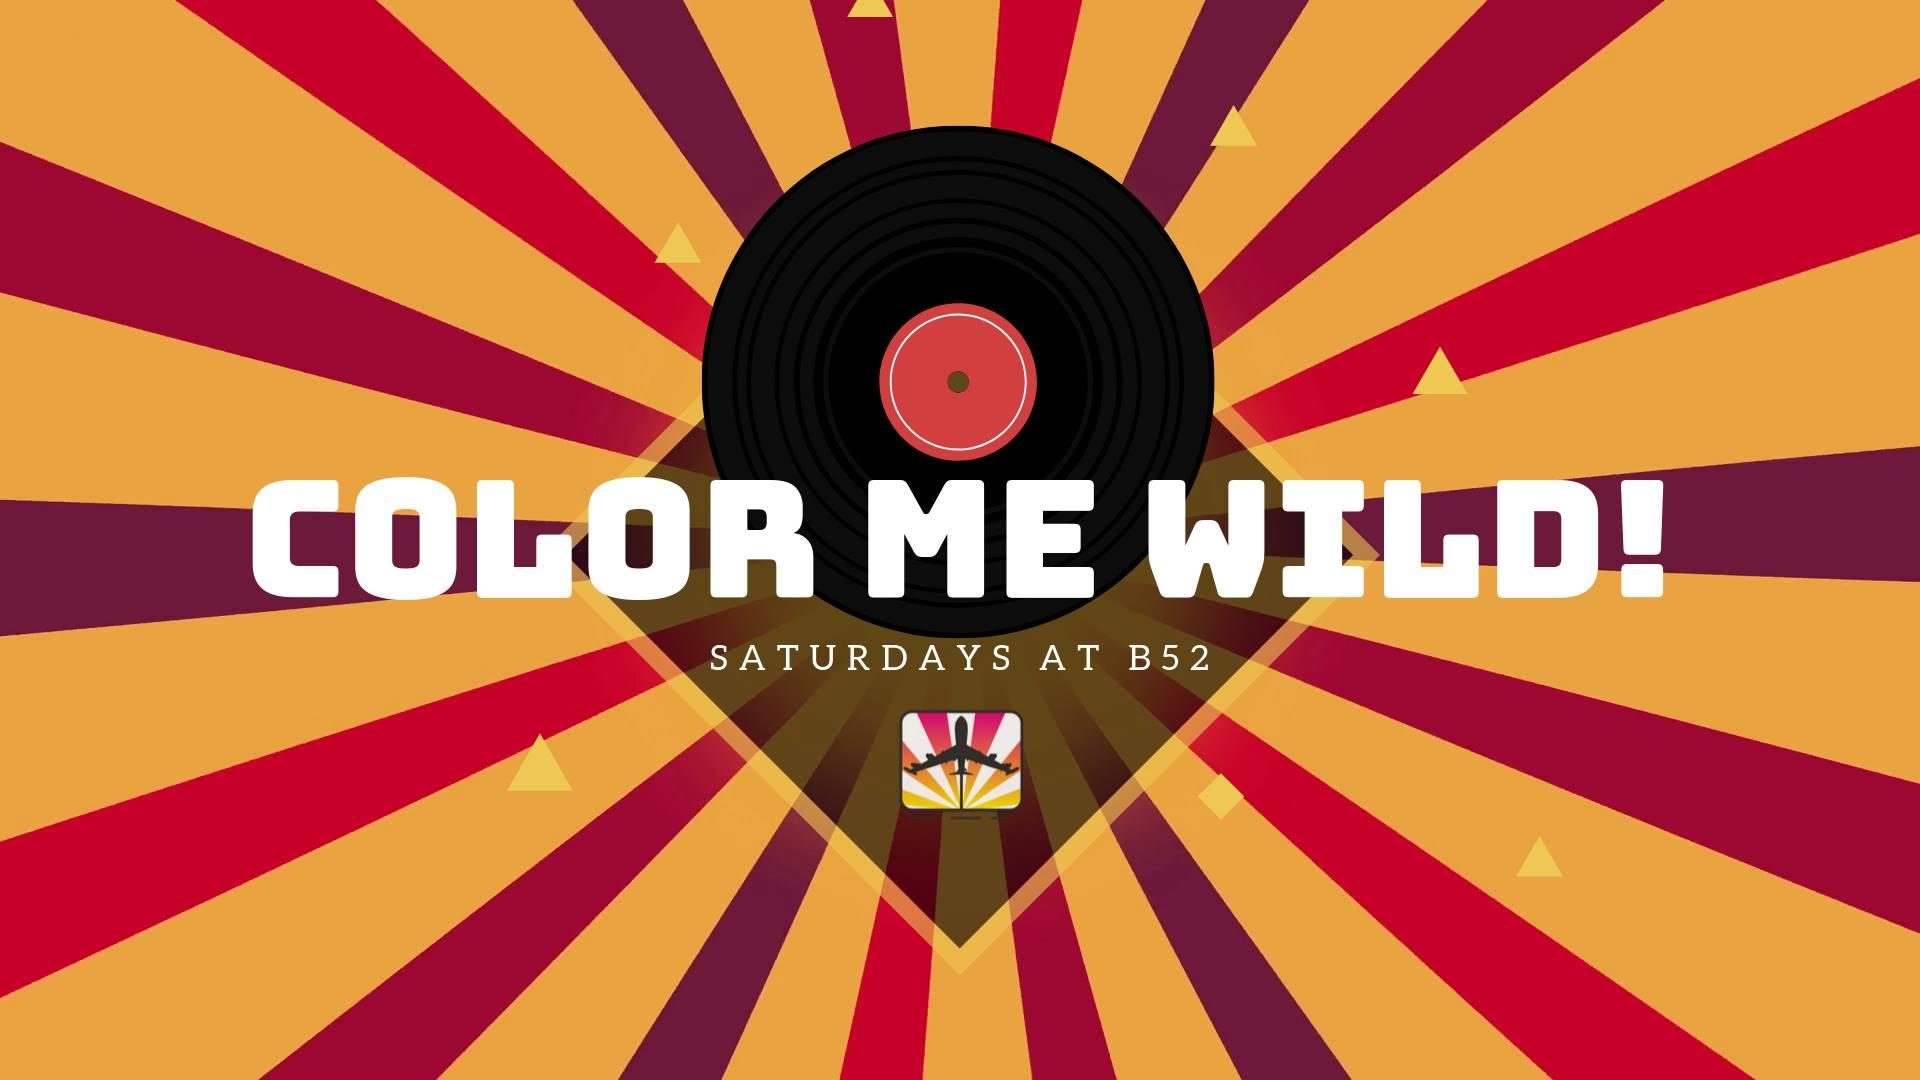 Color Me Wild Party - Saturdays at B52